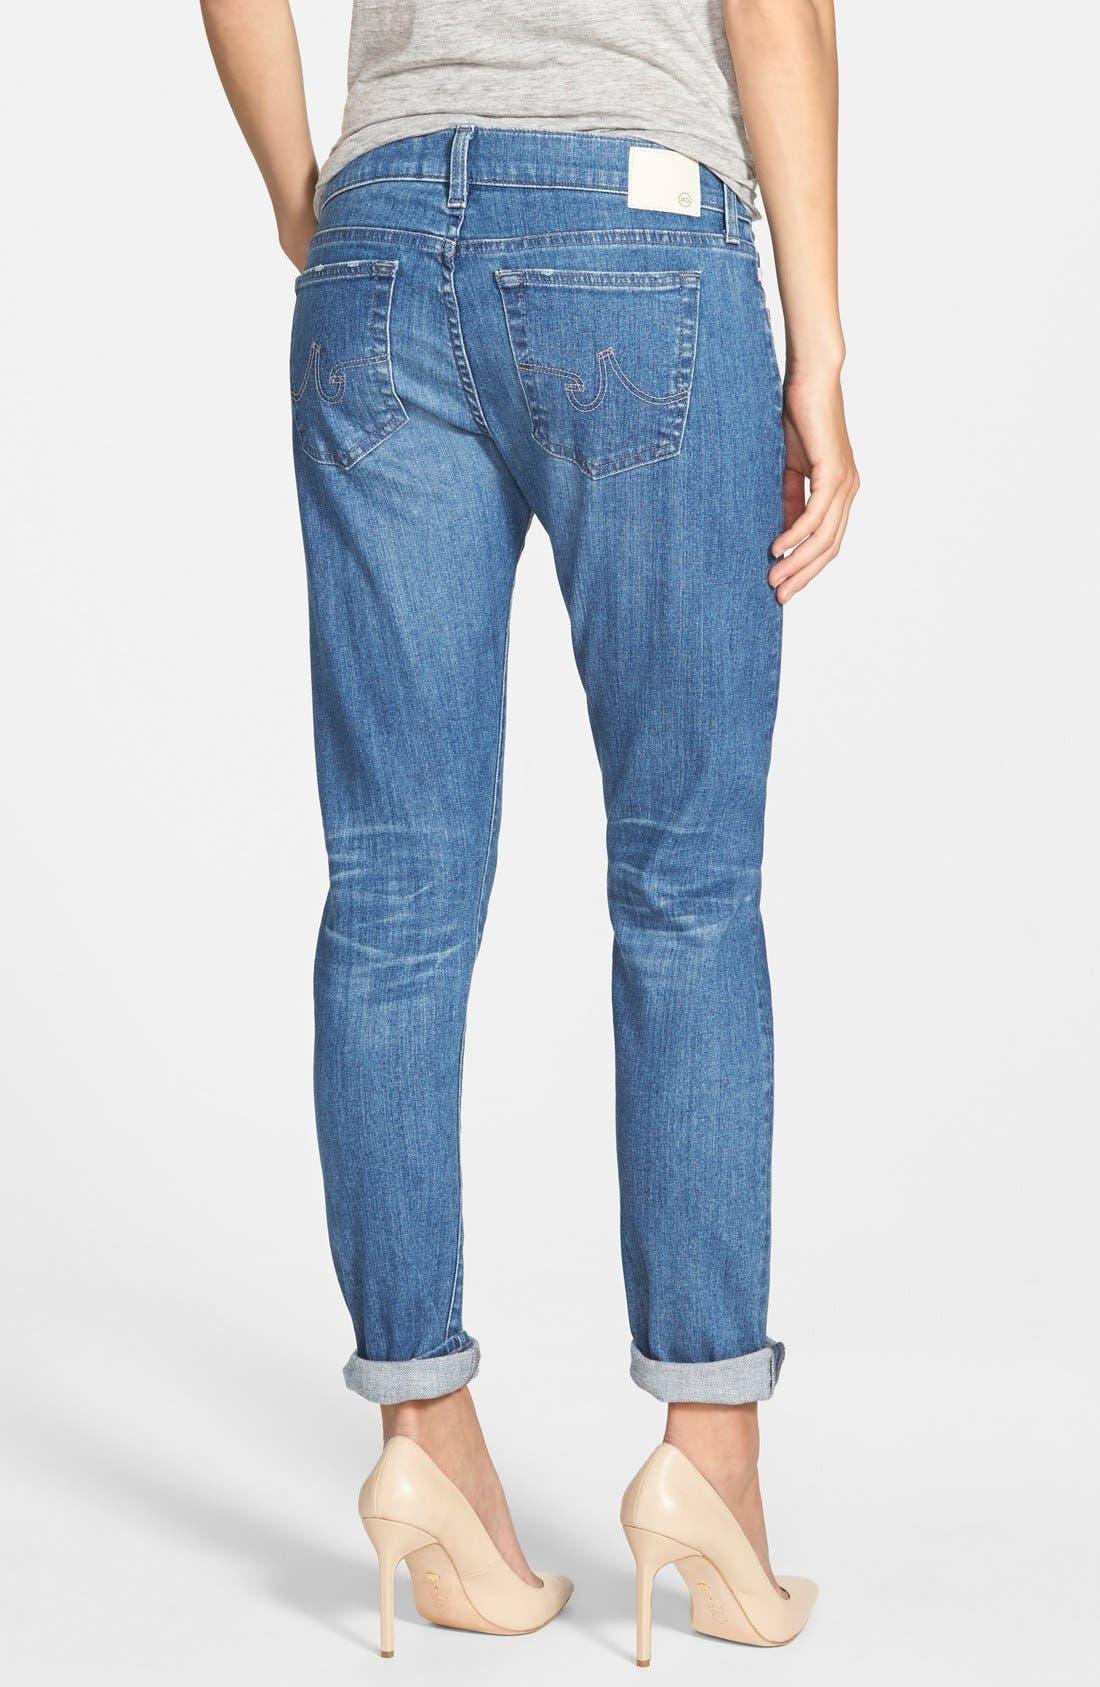 'The Nikki' Relaxed Skinny Jeans,                             Alternate thumbnail 4, color,                             400